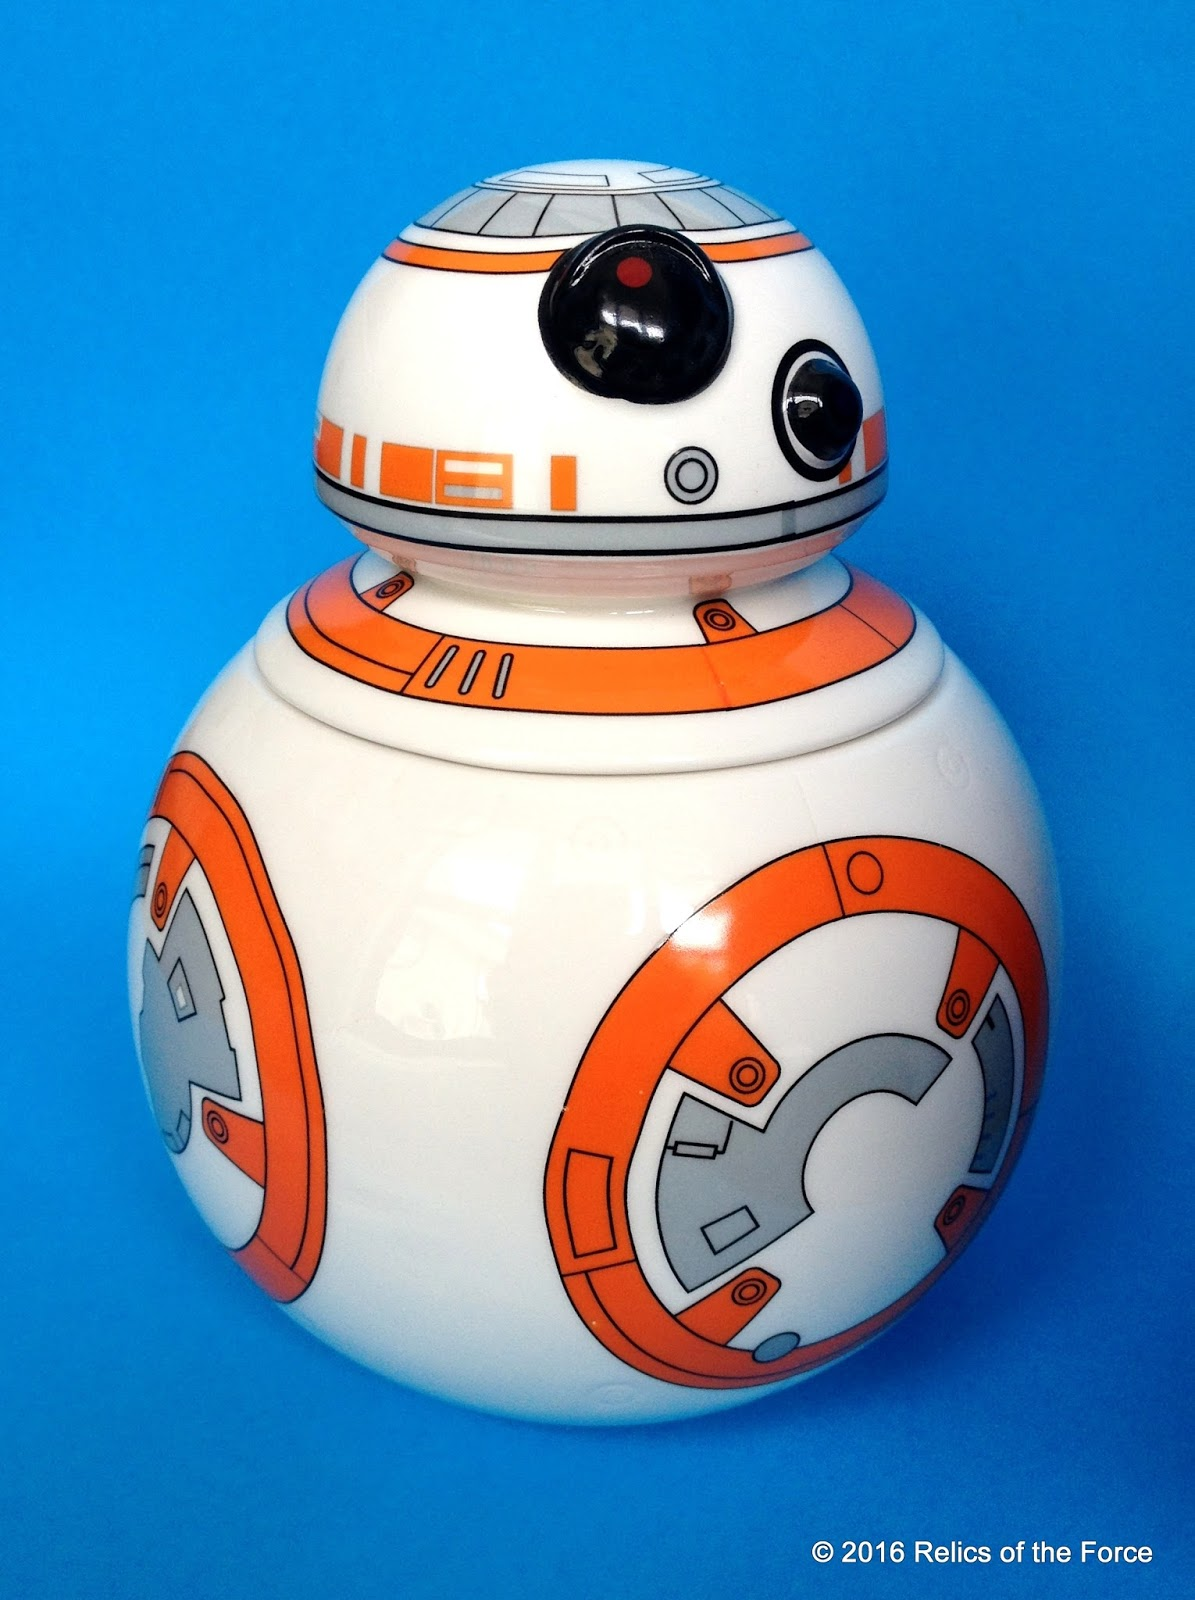 Relics of the force december 2016 - Stormtrooper cookie jar ...